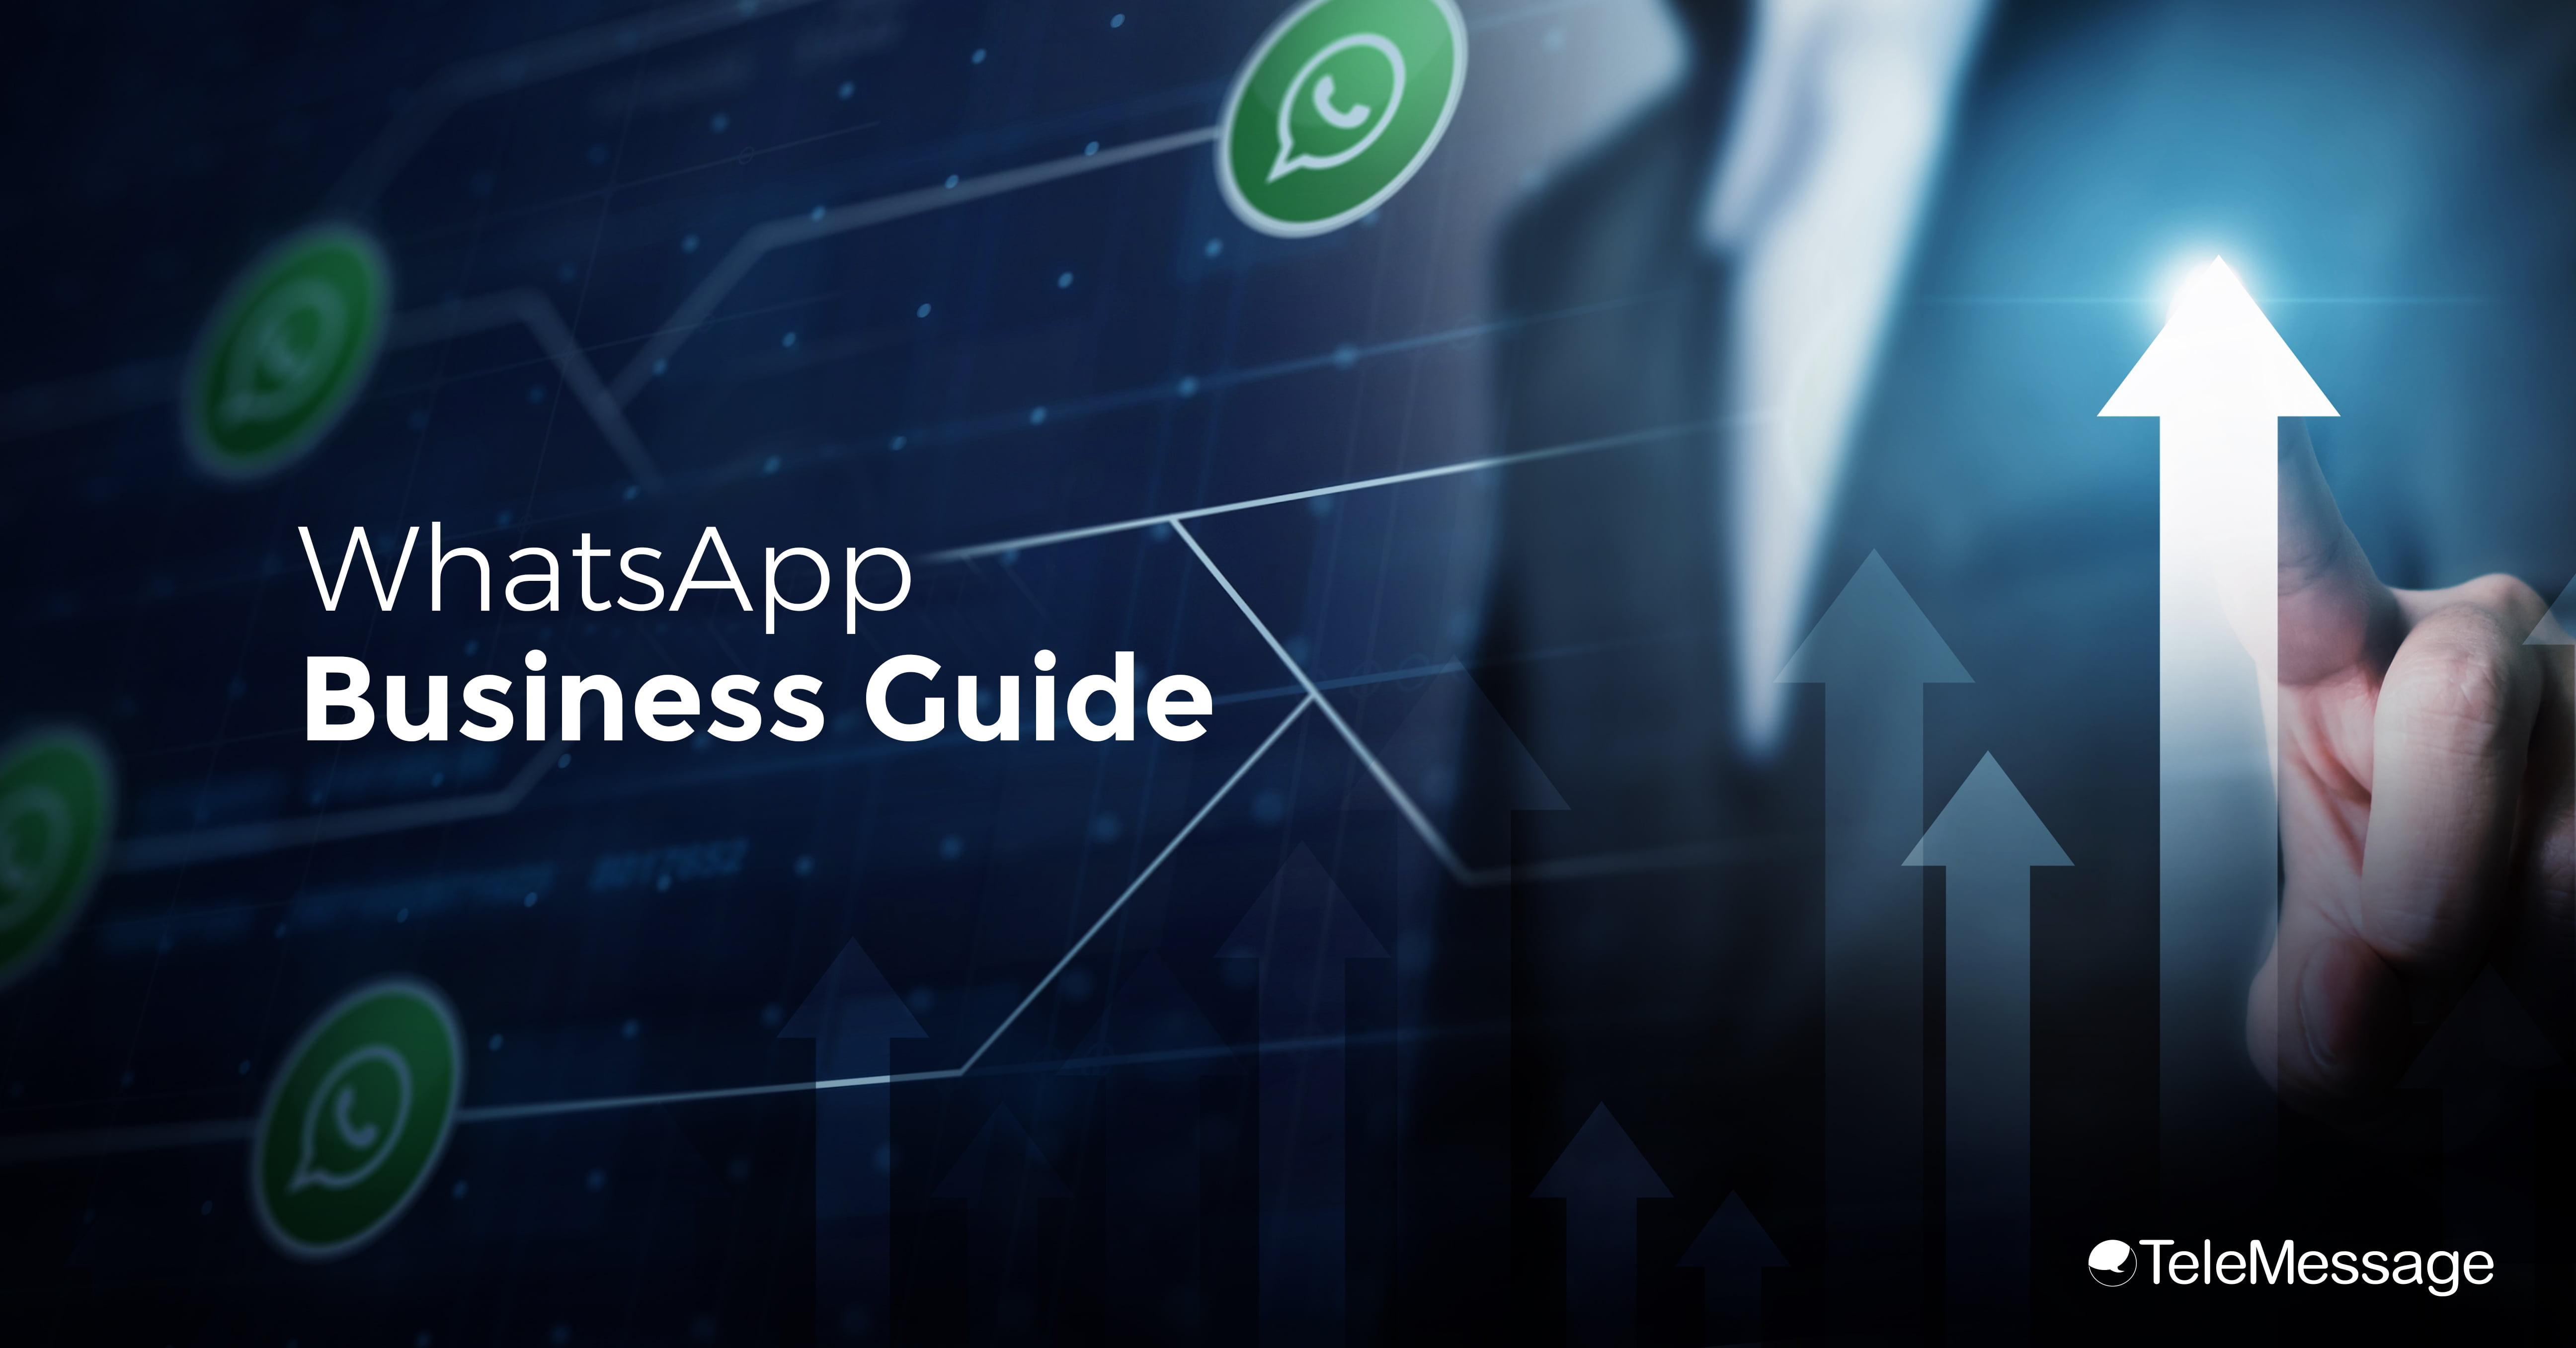 Whatsapp Business Guide Tutorial Telemessage